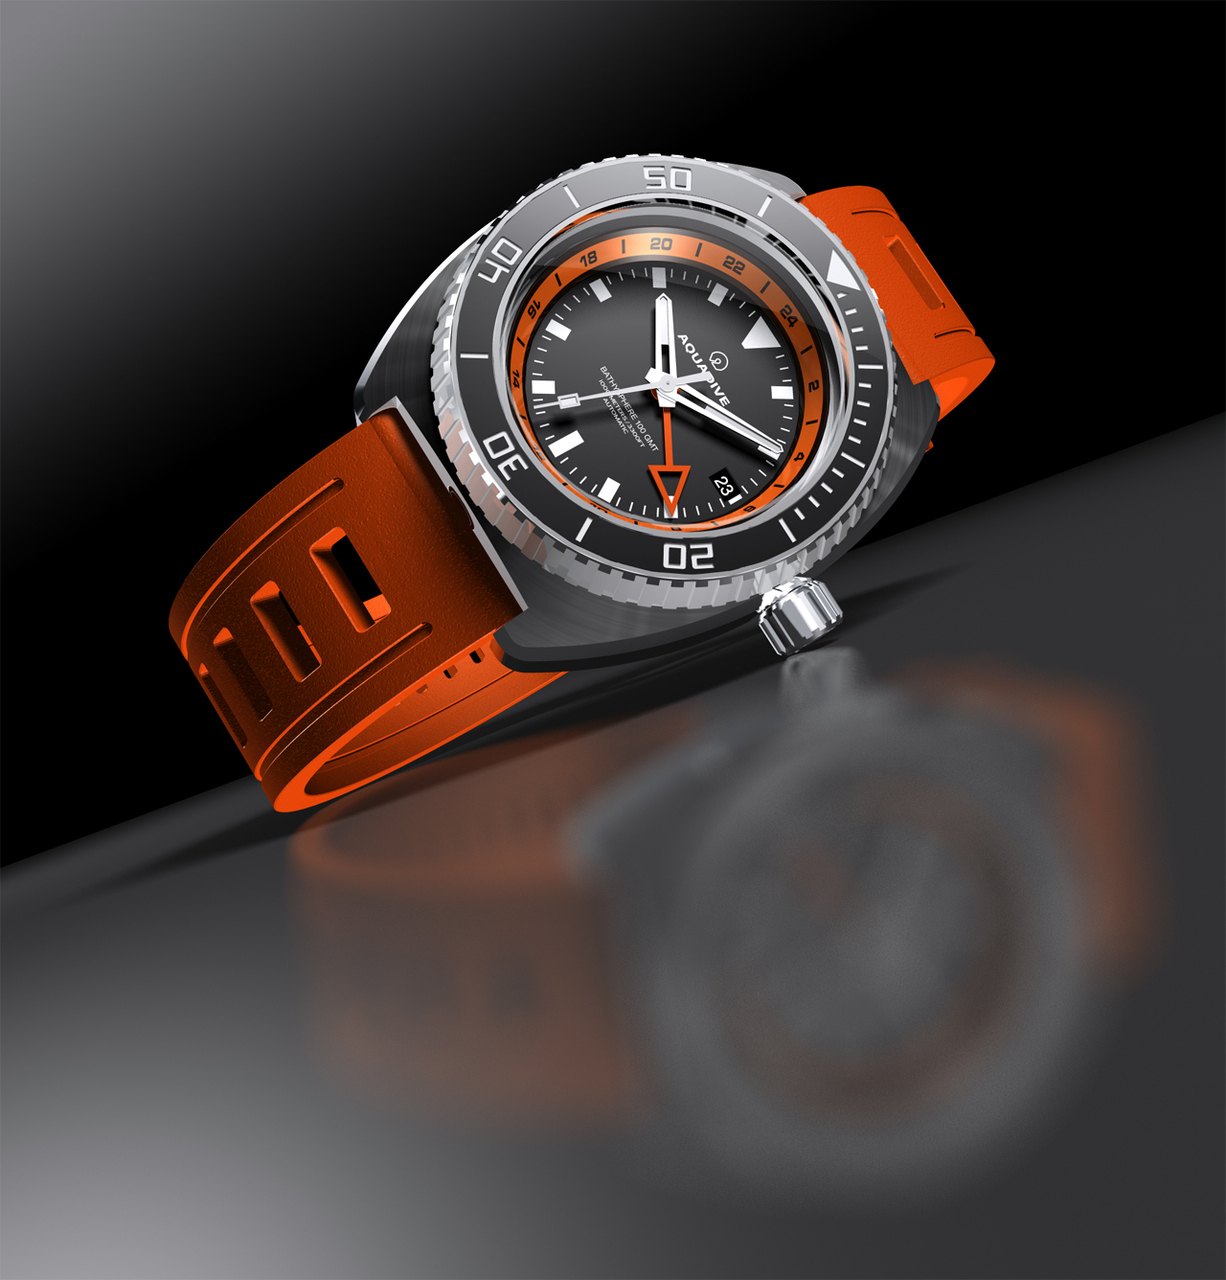 products-orange_bathysphere_GMT__70915.1476777372.1280.1280.